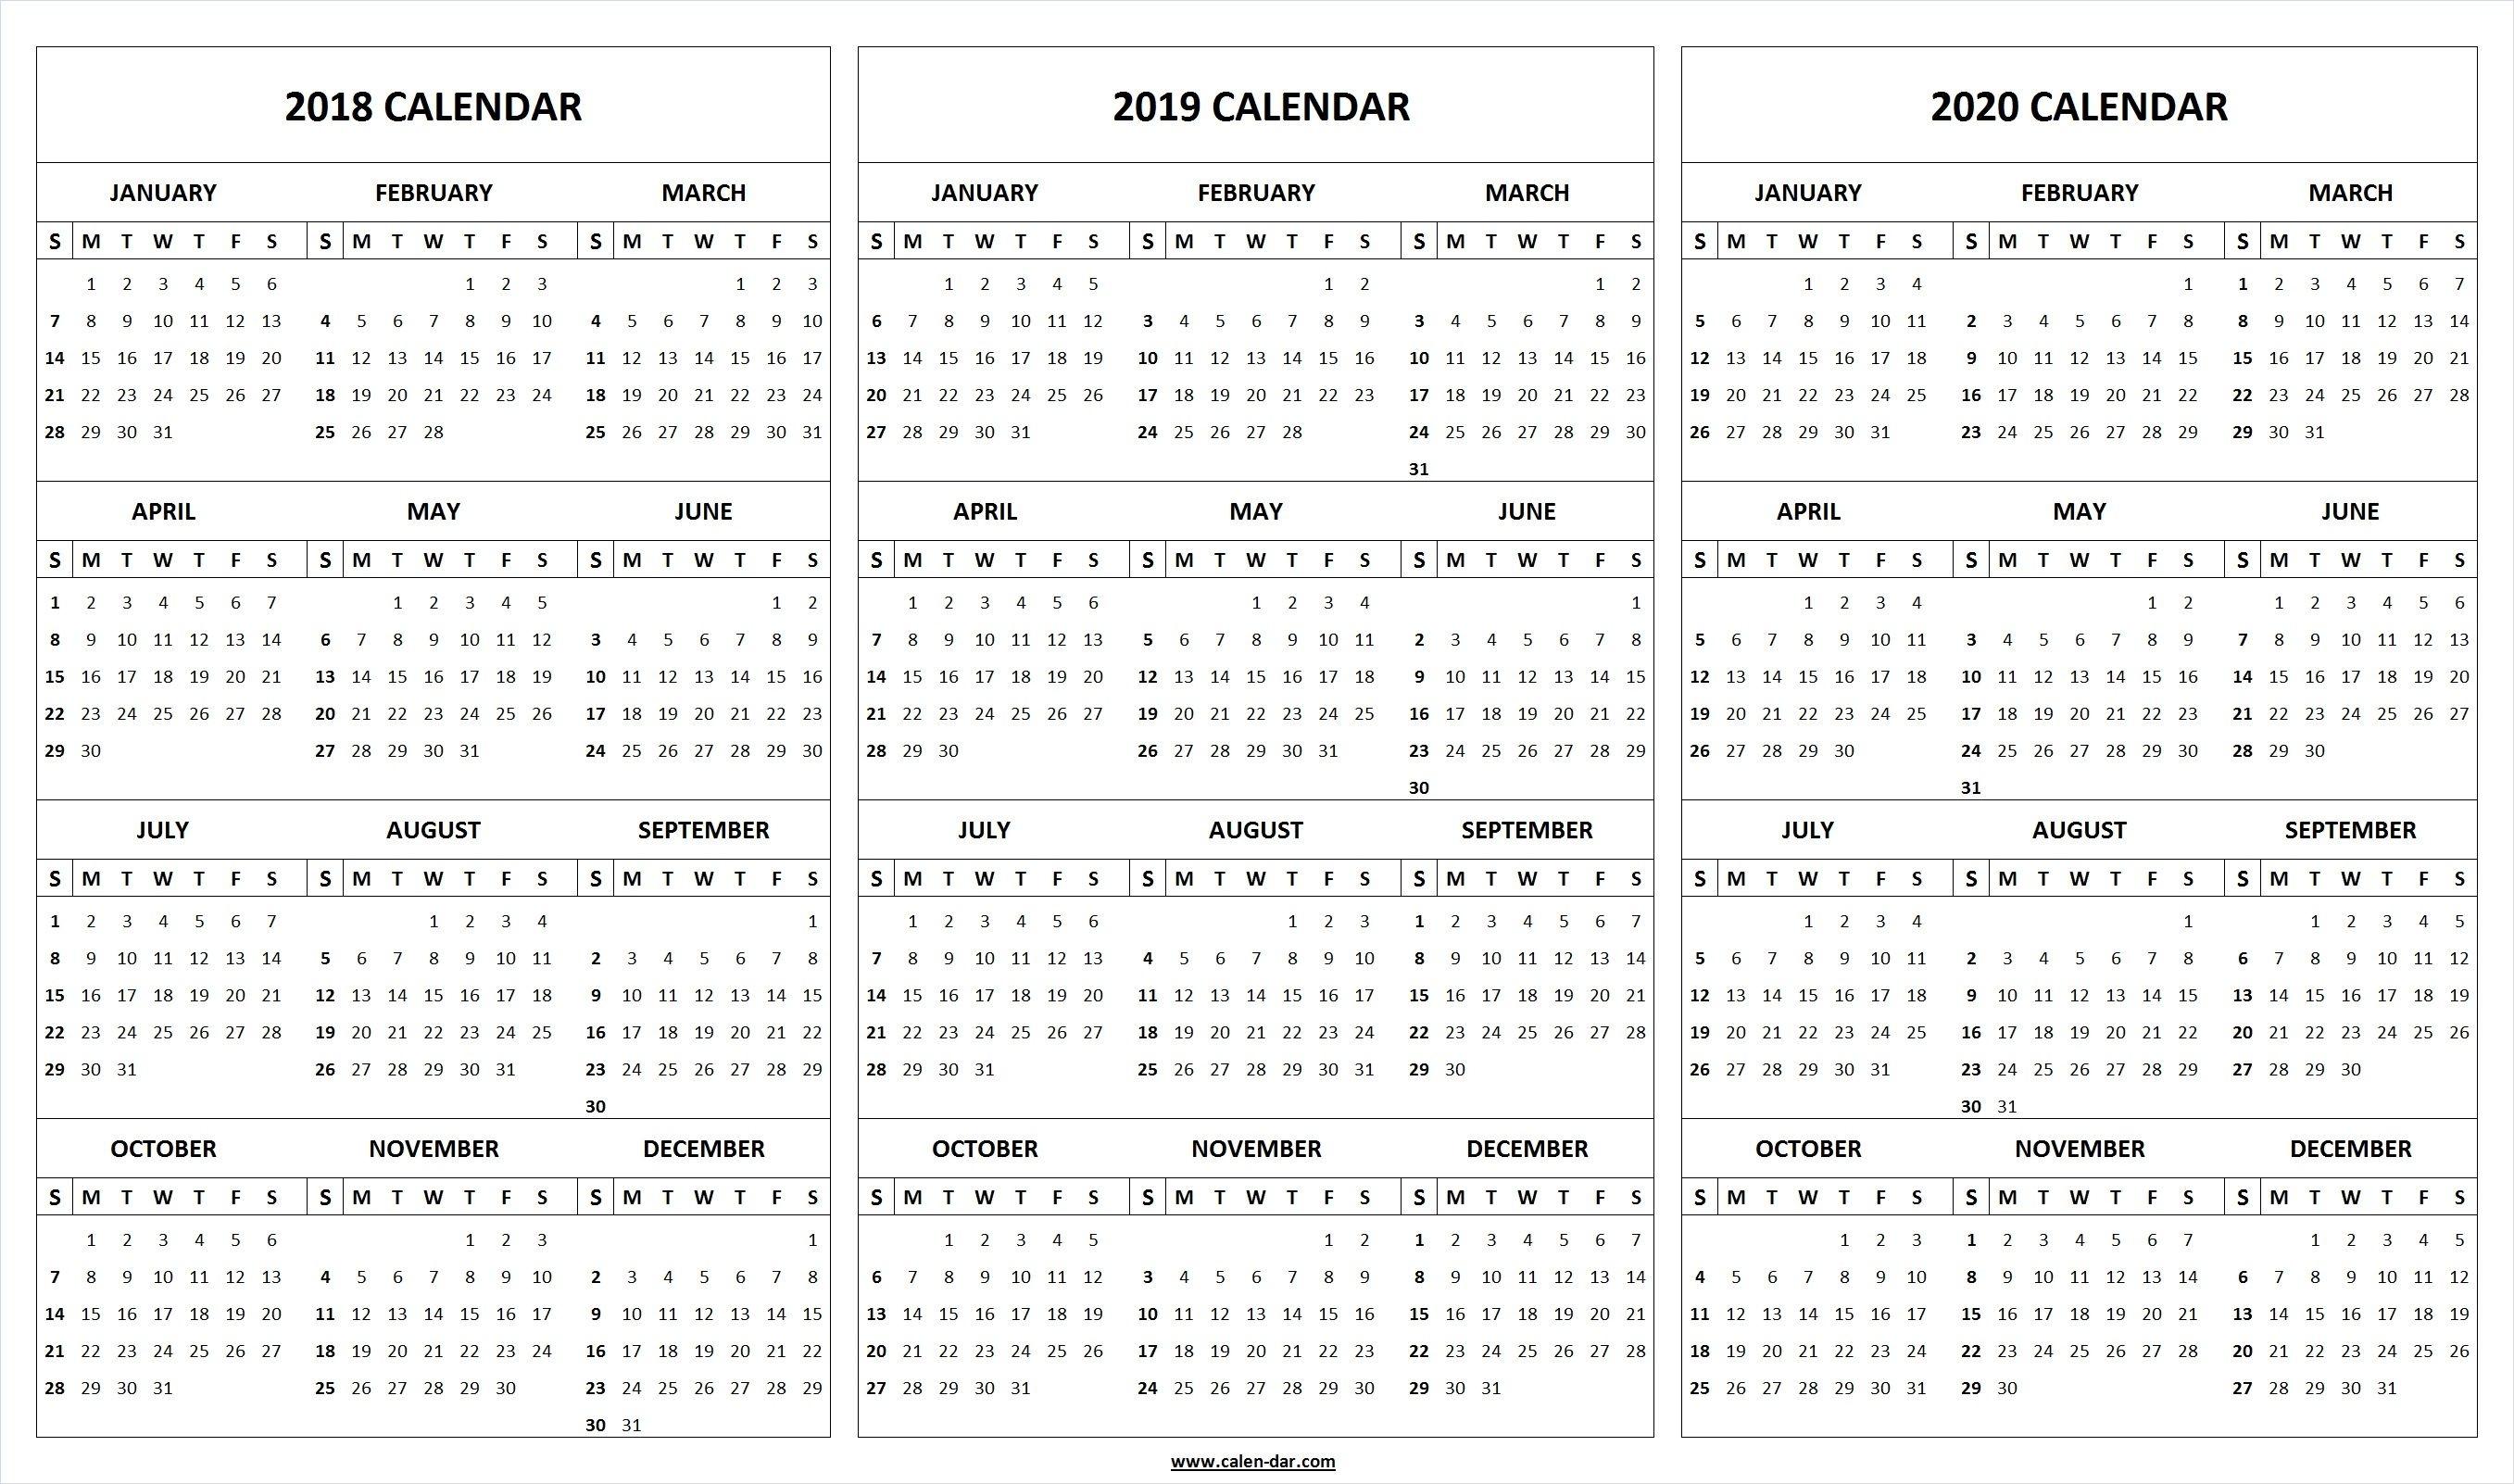 Print Blank 2018 2019 2020 Calendar Template | Organize! | Printable for 2020 Calendar With Space To Write